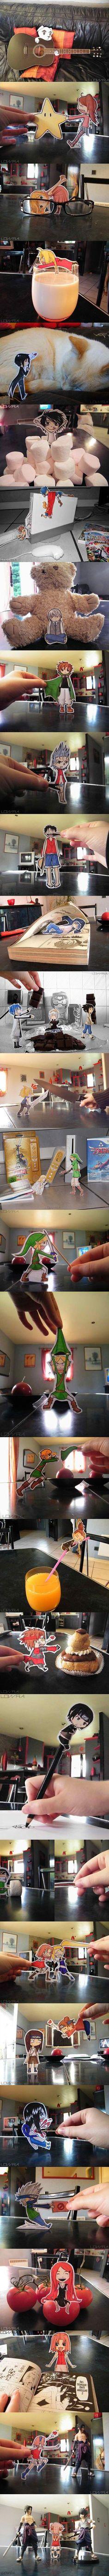 Anime Paper Arts